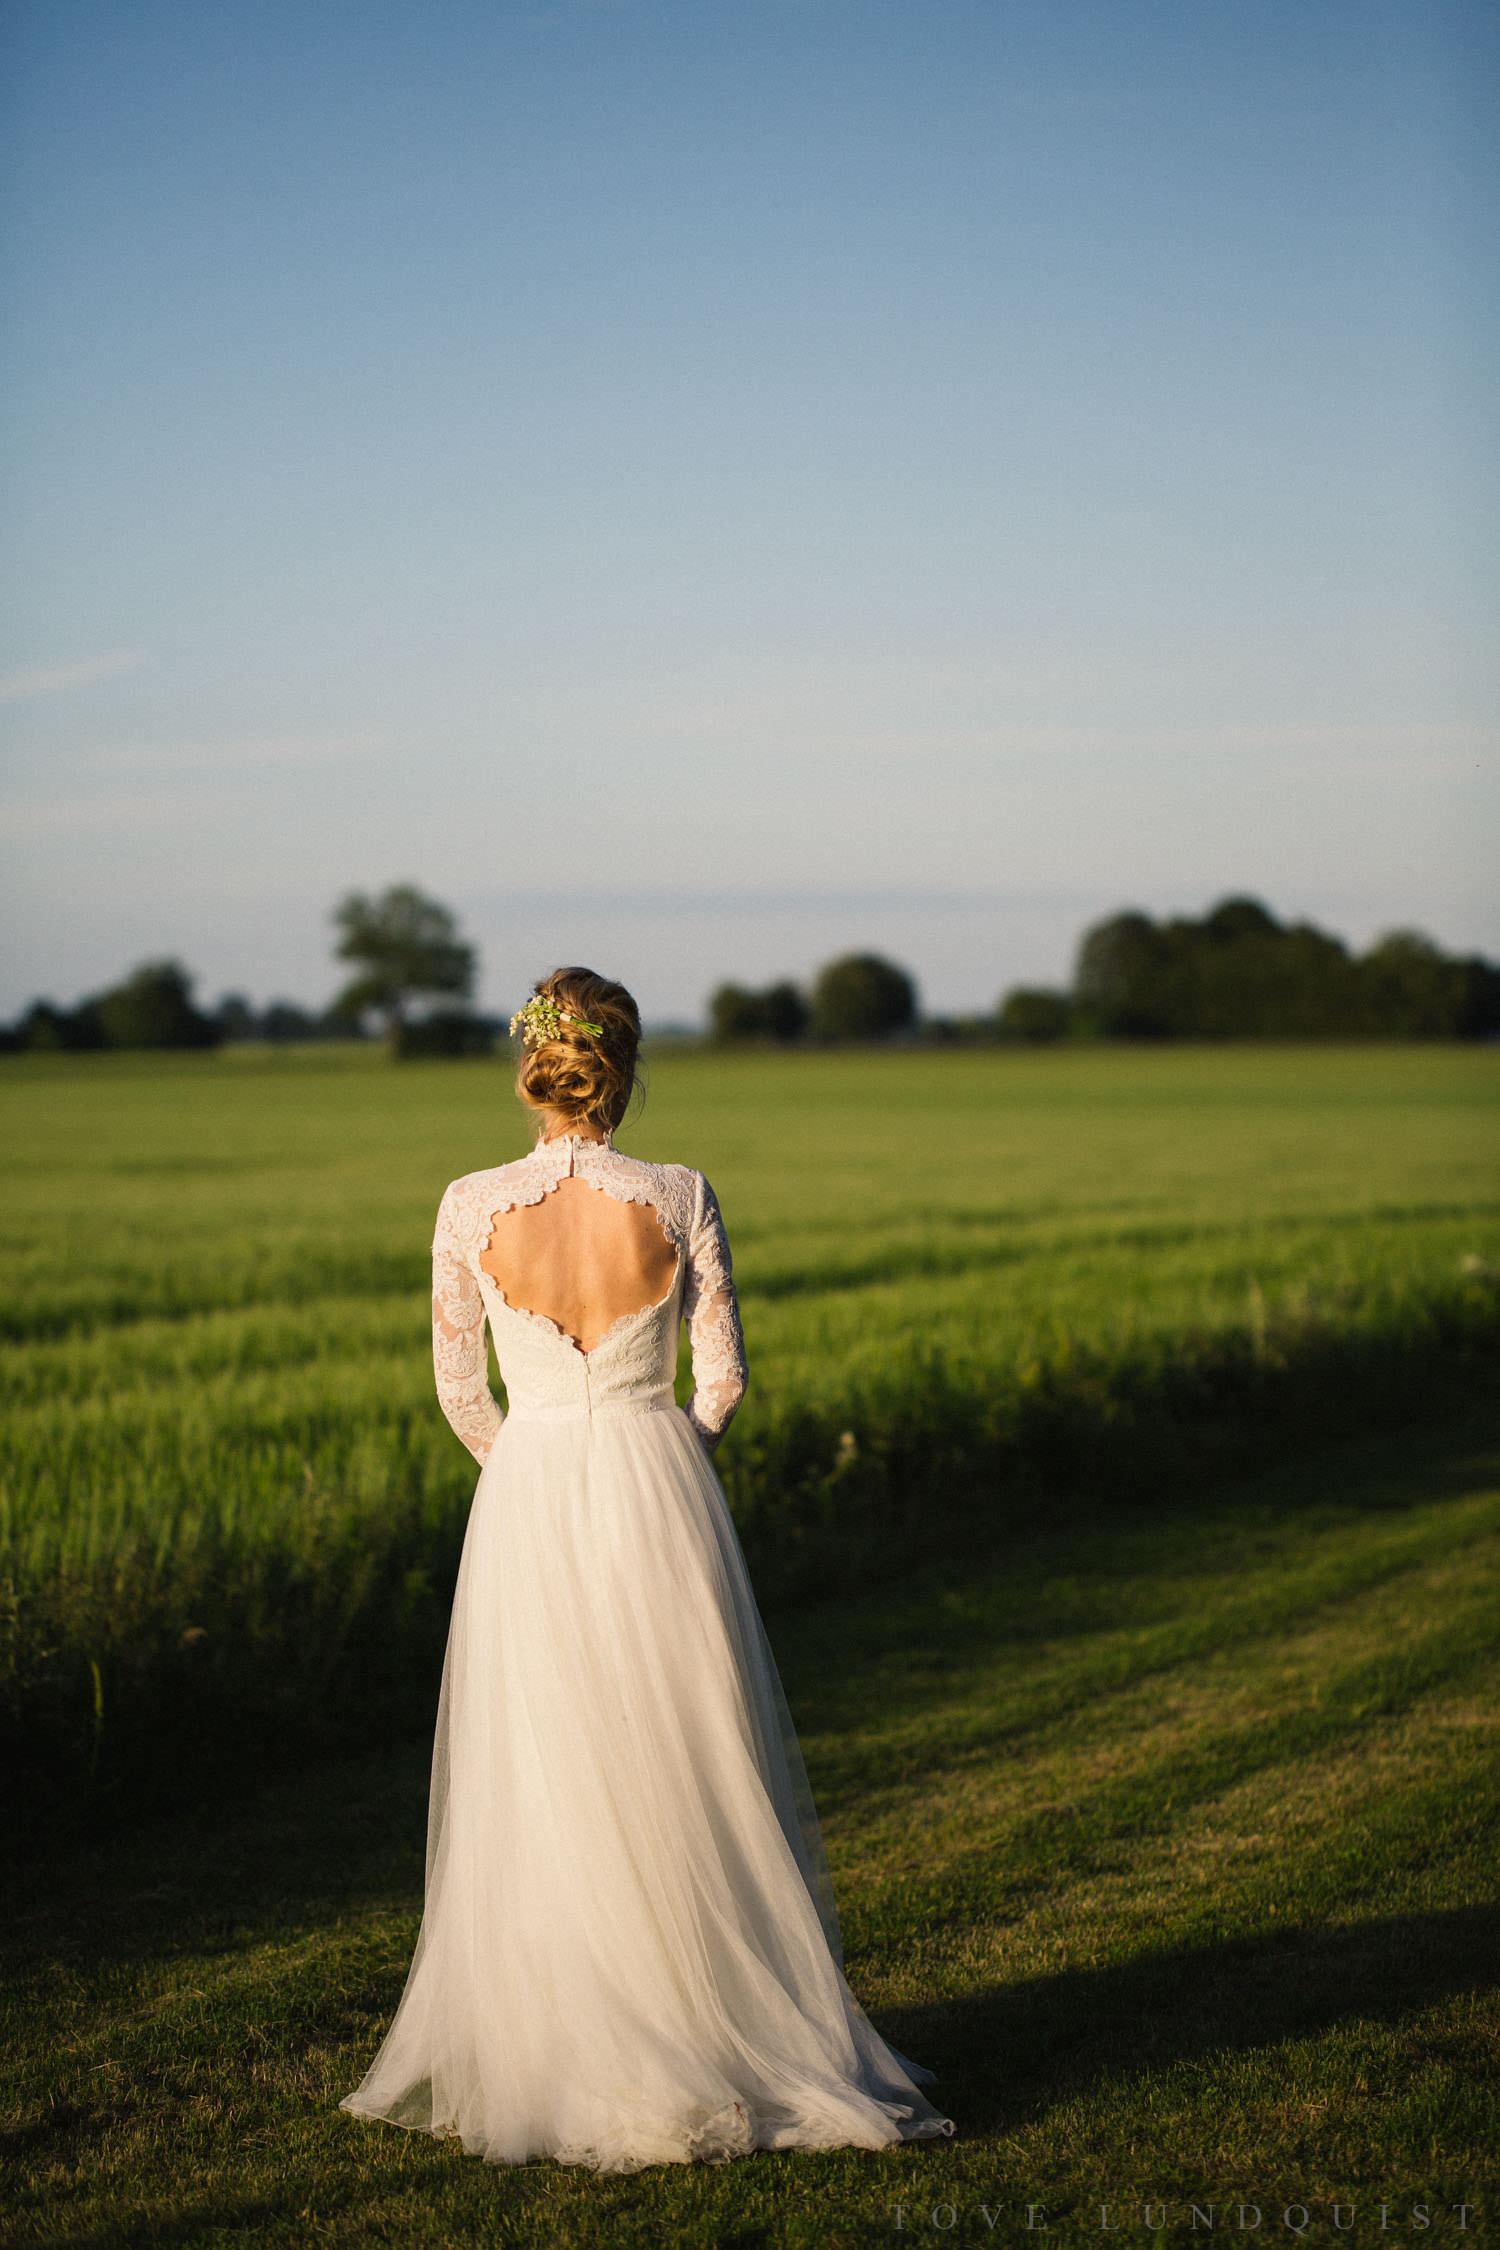 Eternity Dress från Ida Sjöstedt Couture. Bröllopsfotograf är Tove Lundquist, bröllopslokalen är Idala Gård i Skåne.